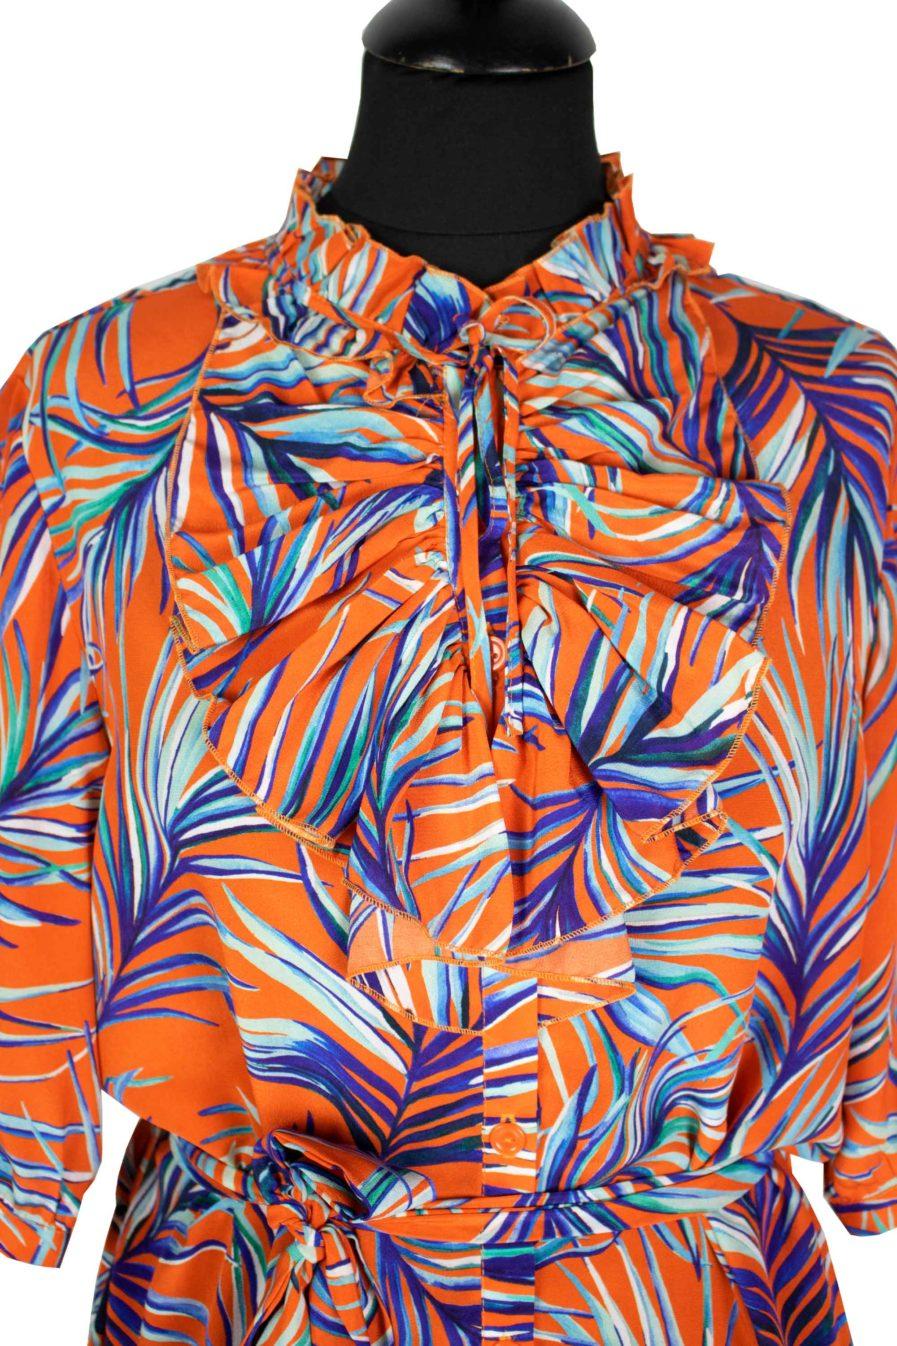 Jabotkleid Orange Jungle